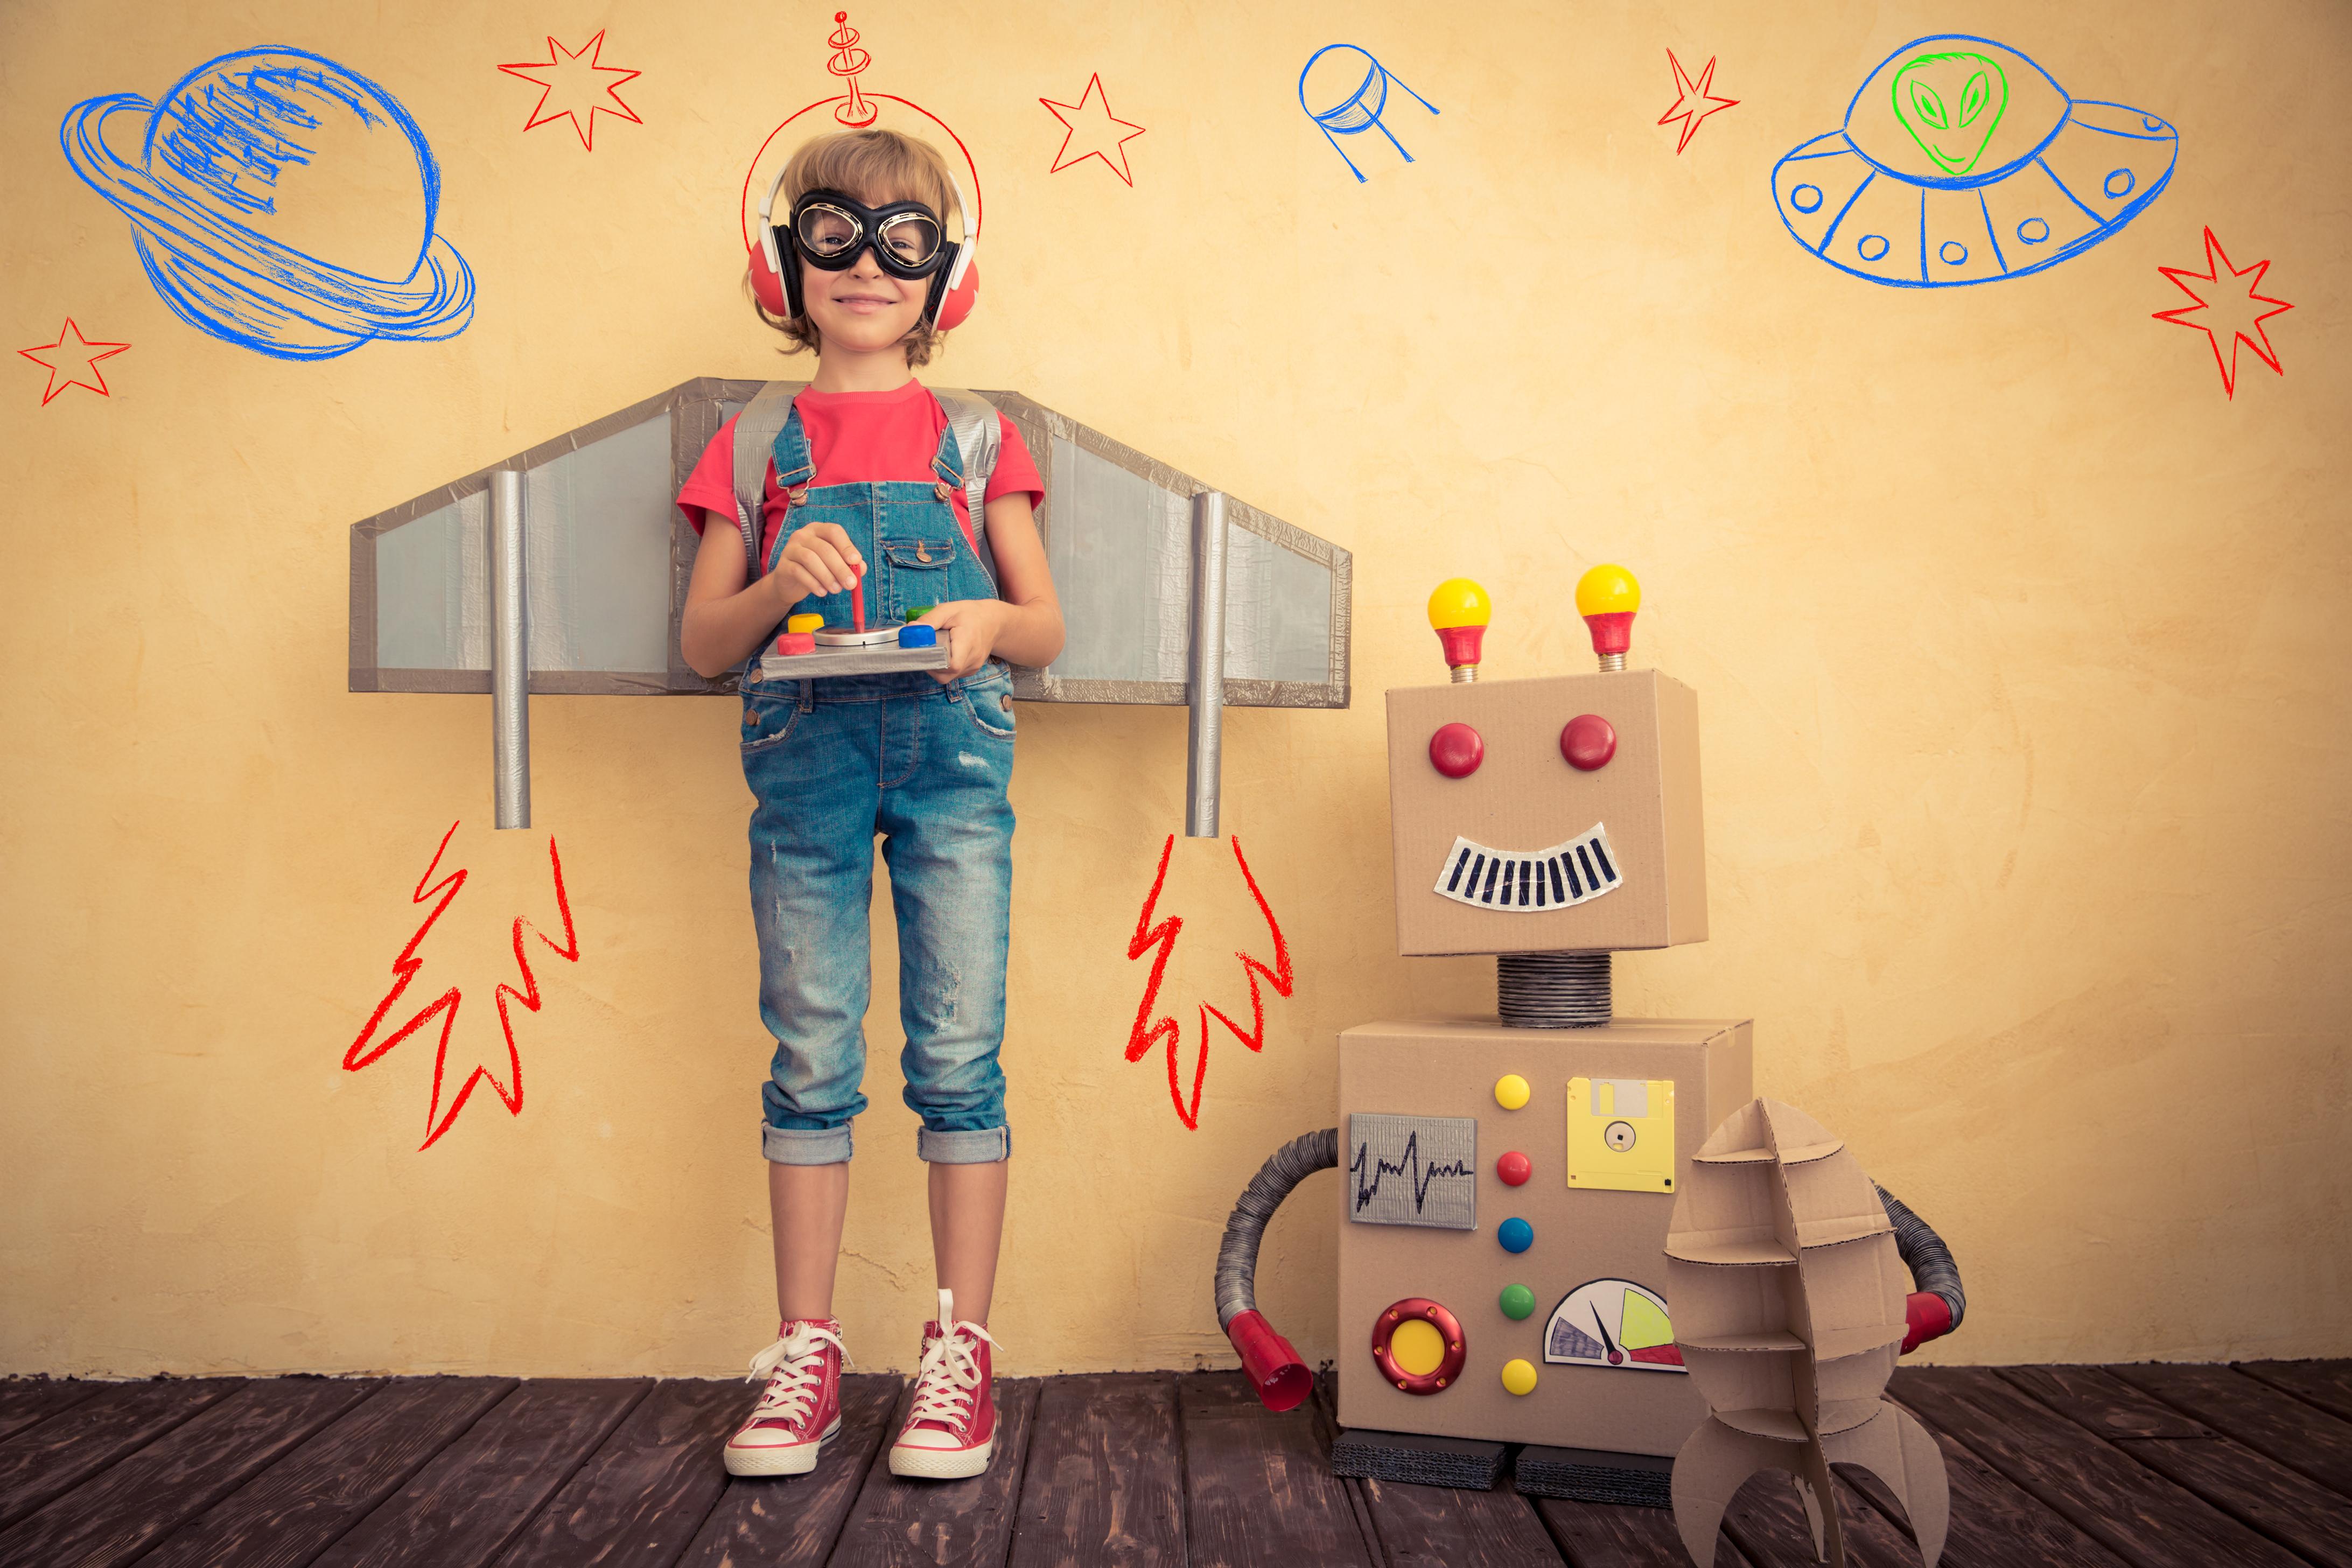 Inspiration: 5 Dinge, die kreative Kinder ausmachen